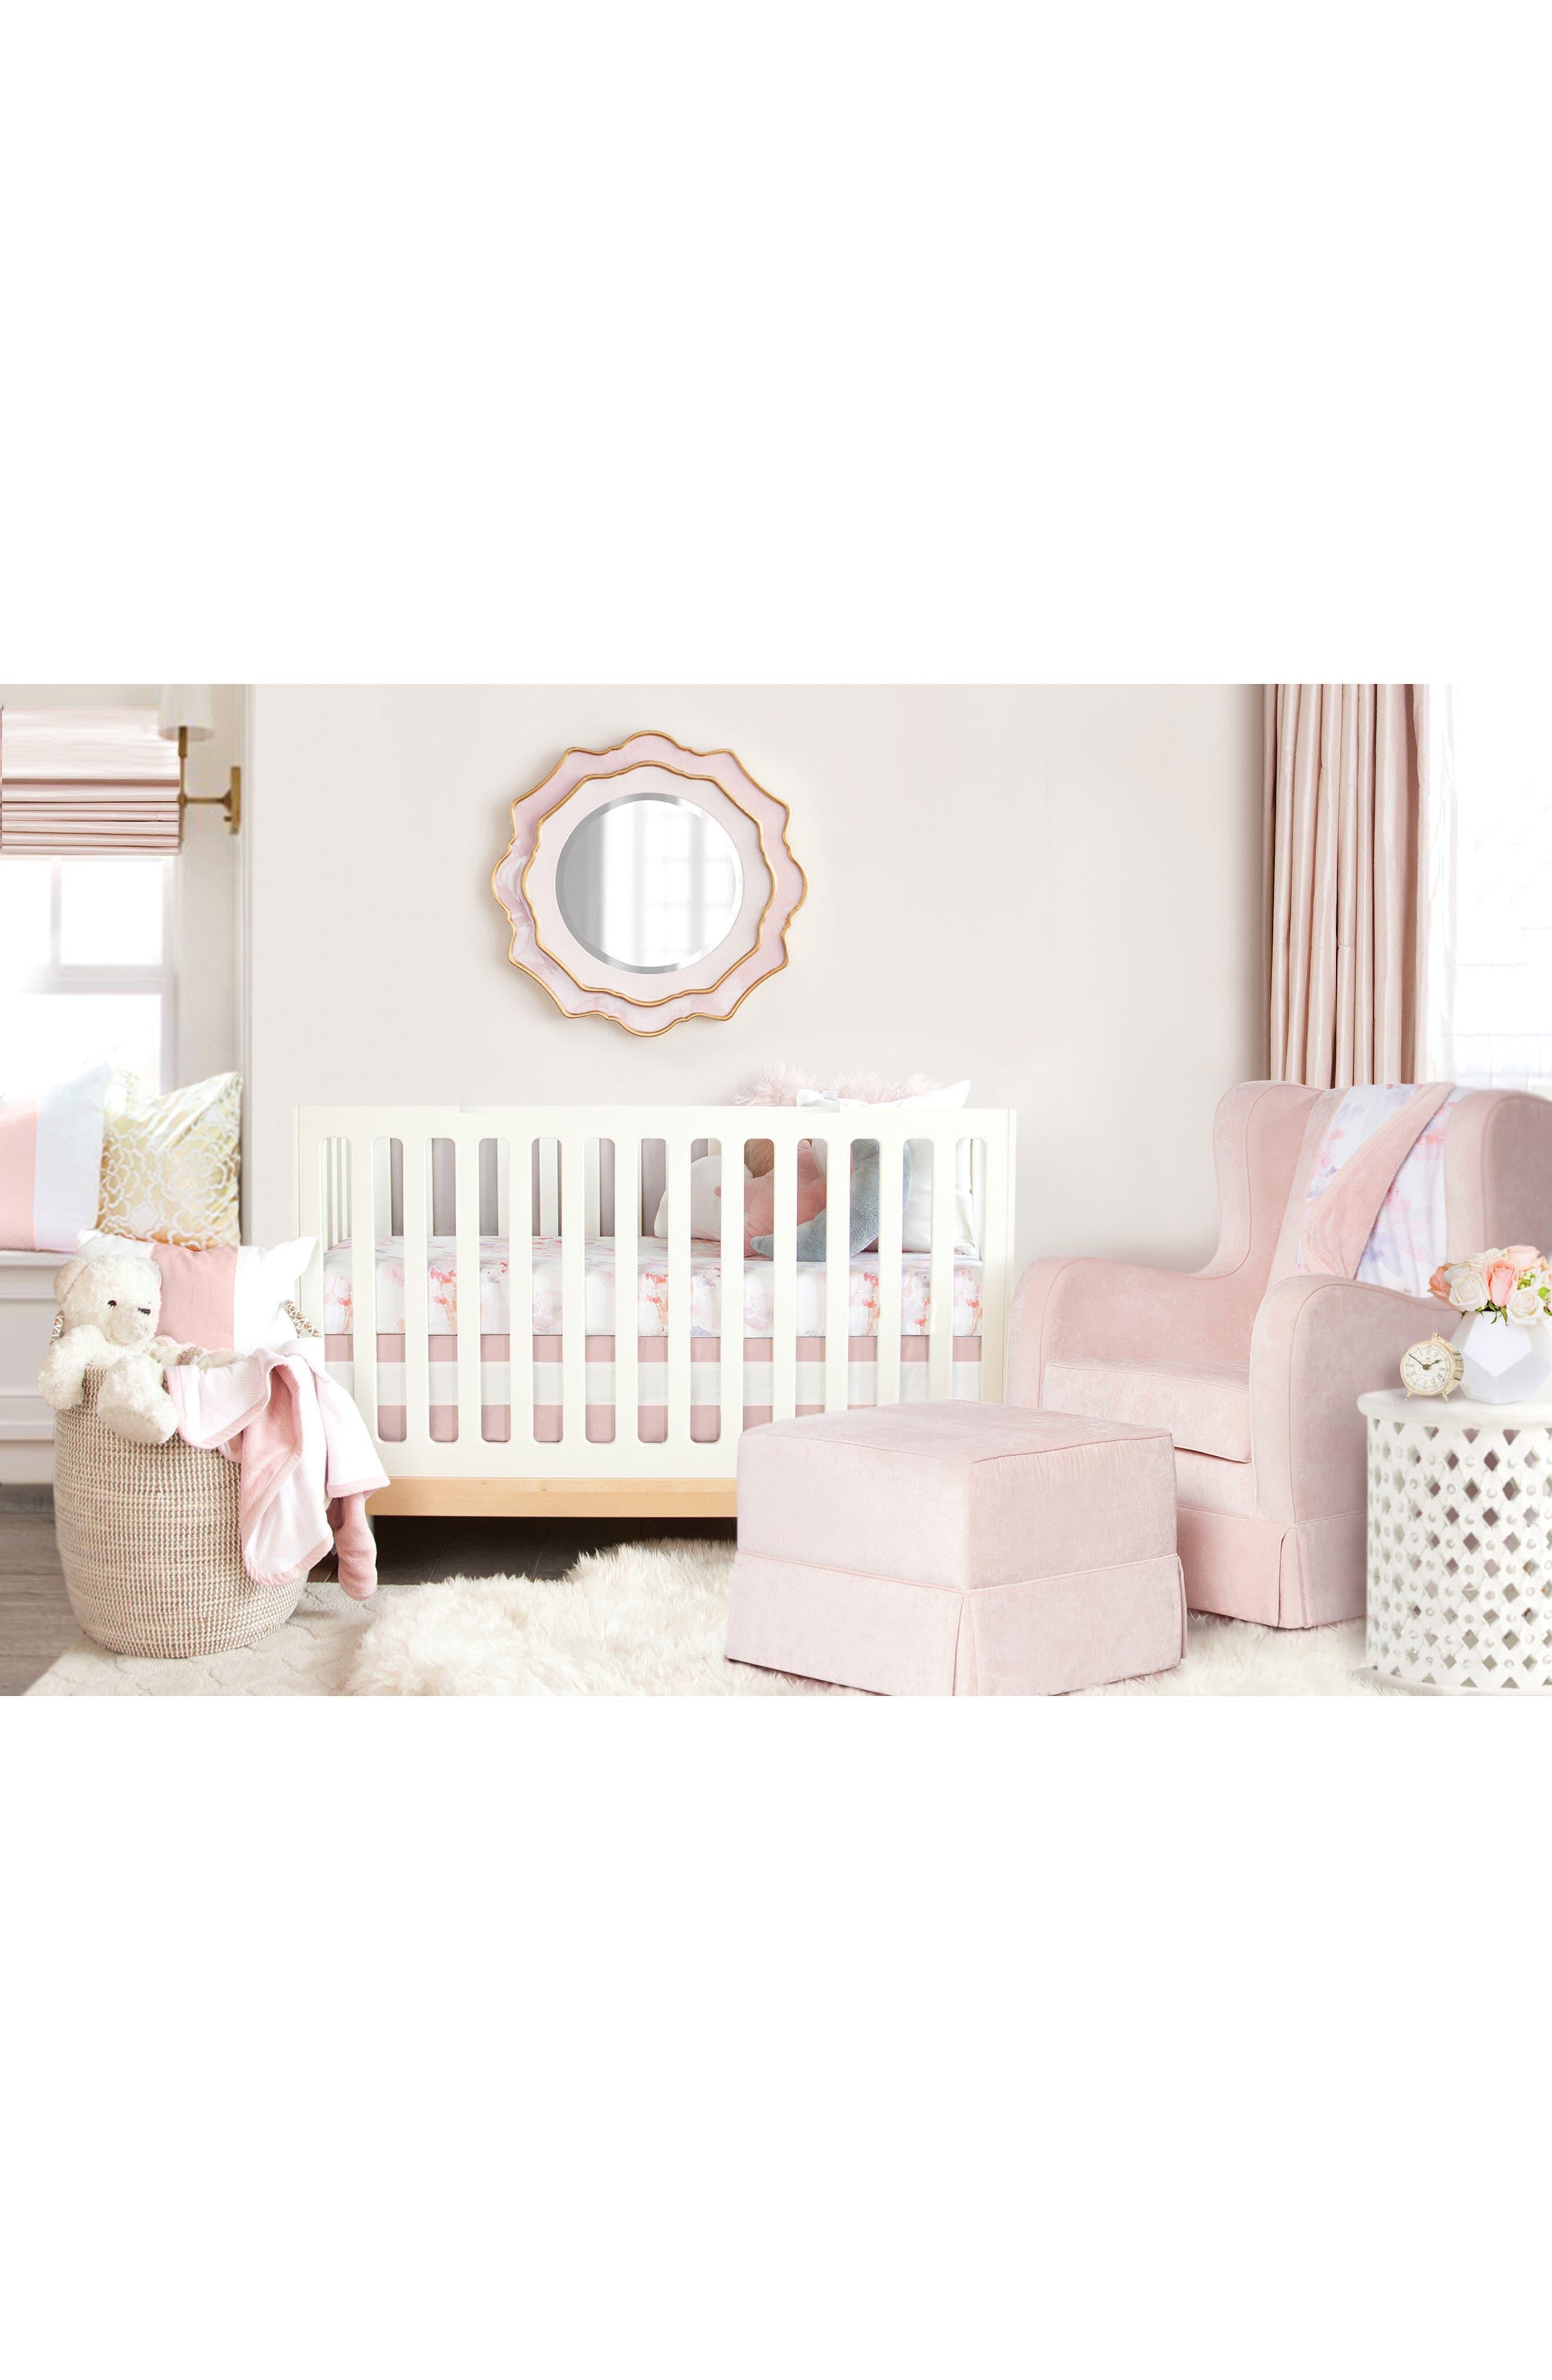 OILO, Prim Cuddle Blanket, Crib Skirt & Crib Sheet Set, Alternate thumbnail 7, color, PRIM